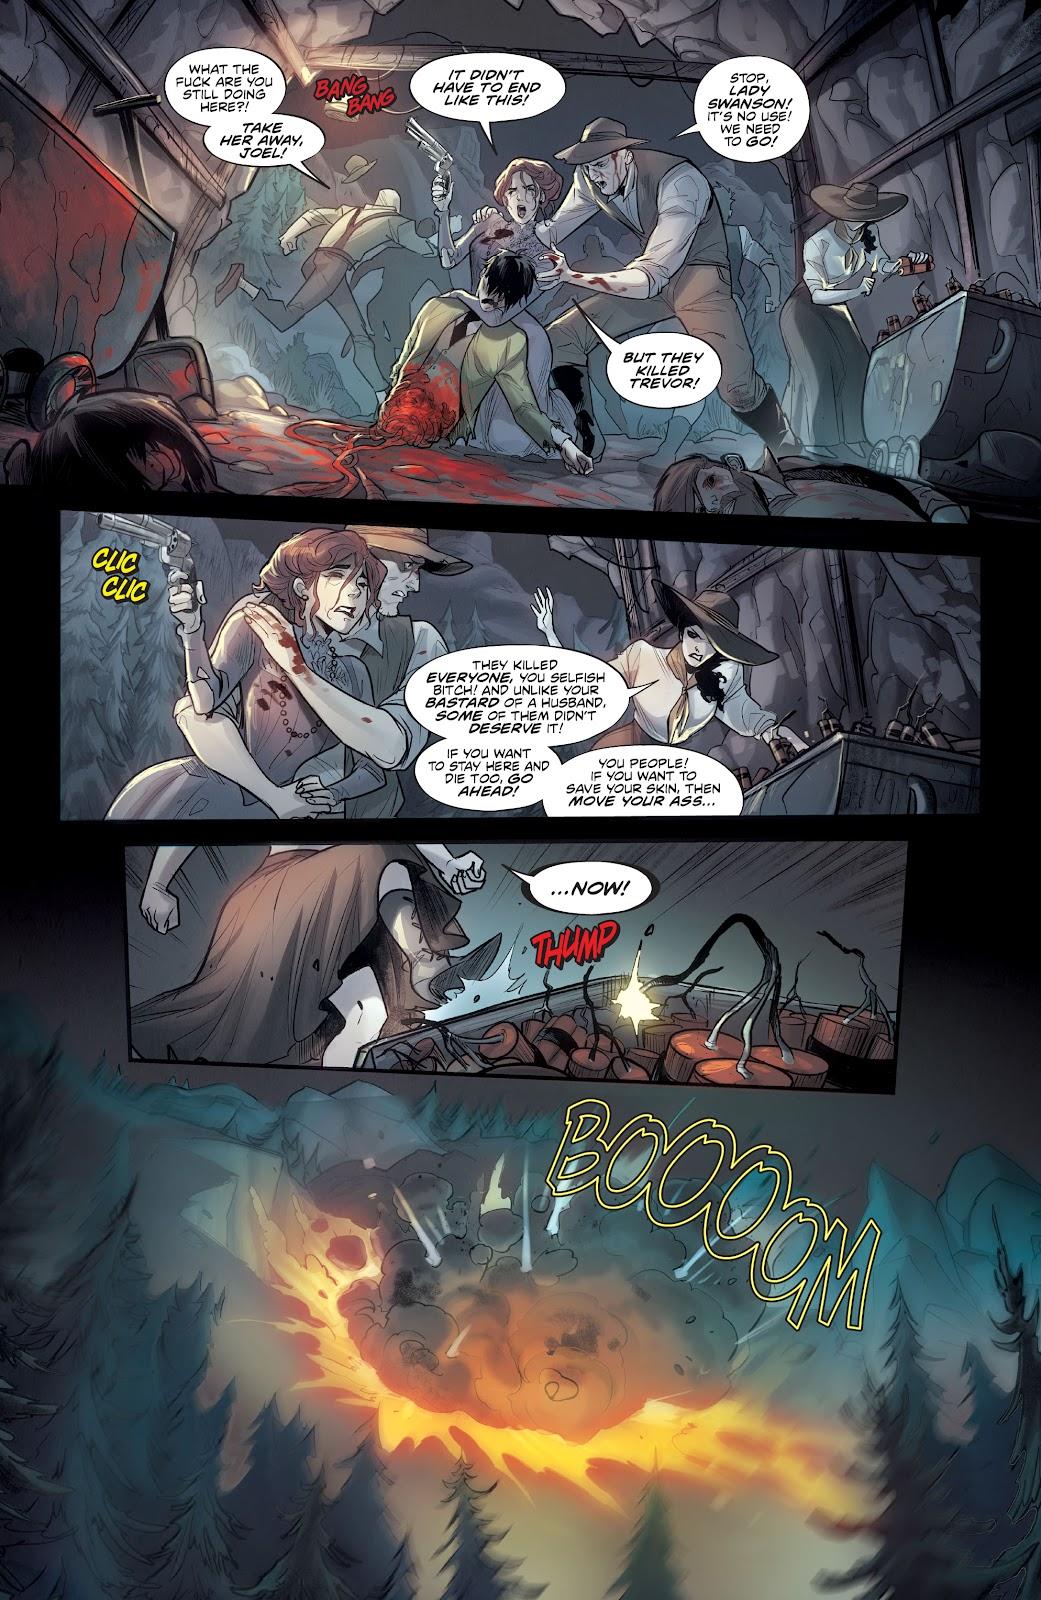 Read online Mirka Andolfo's Mercy comic -  Issue #1 - 4